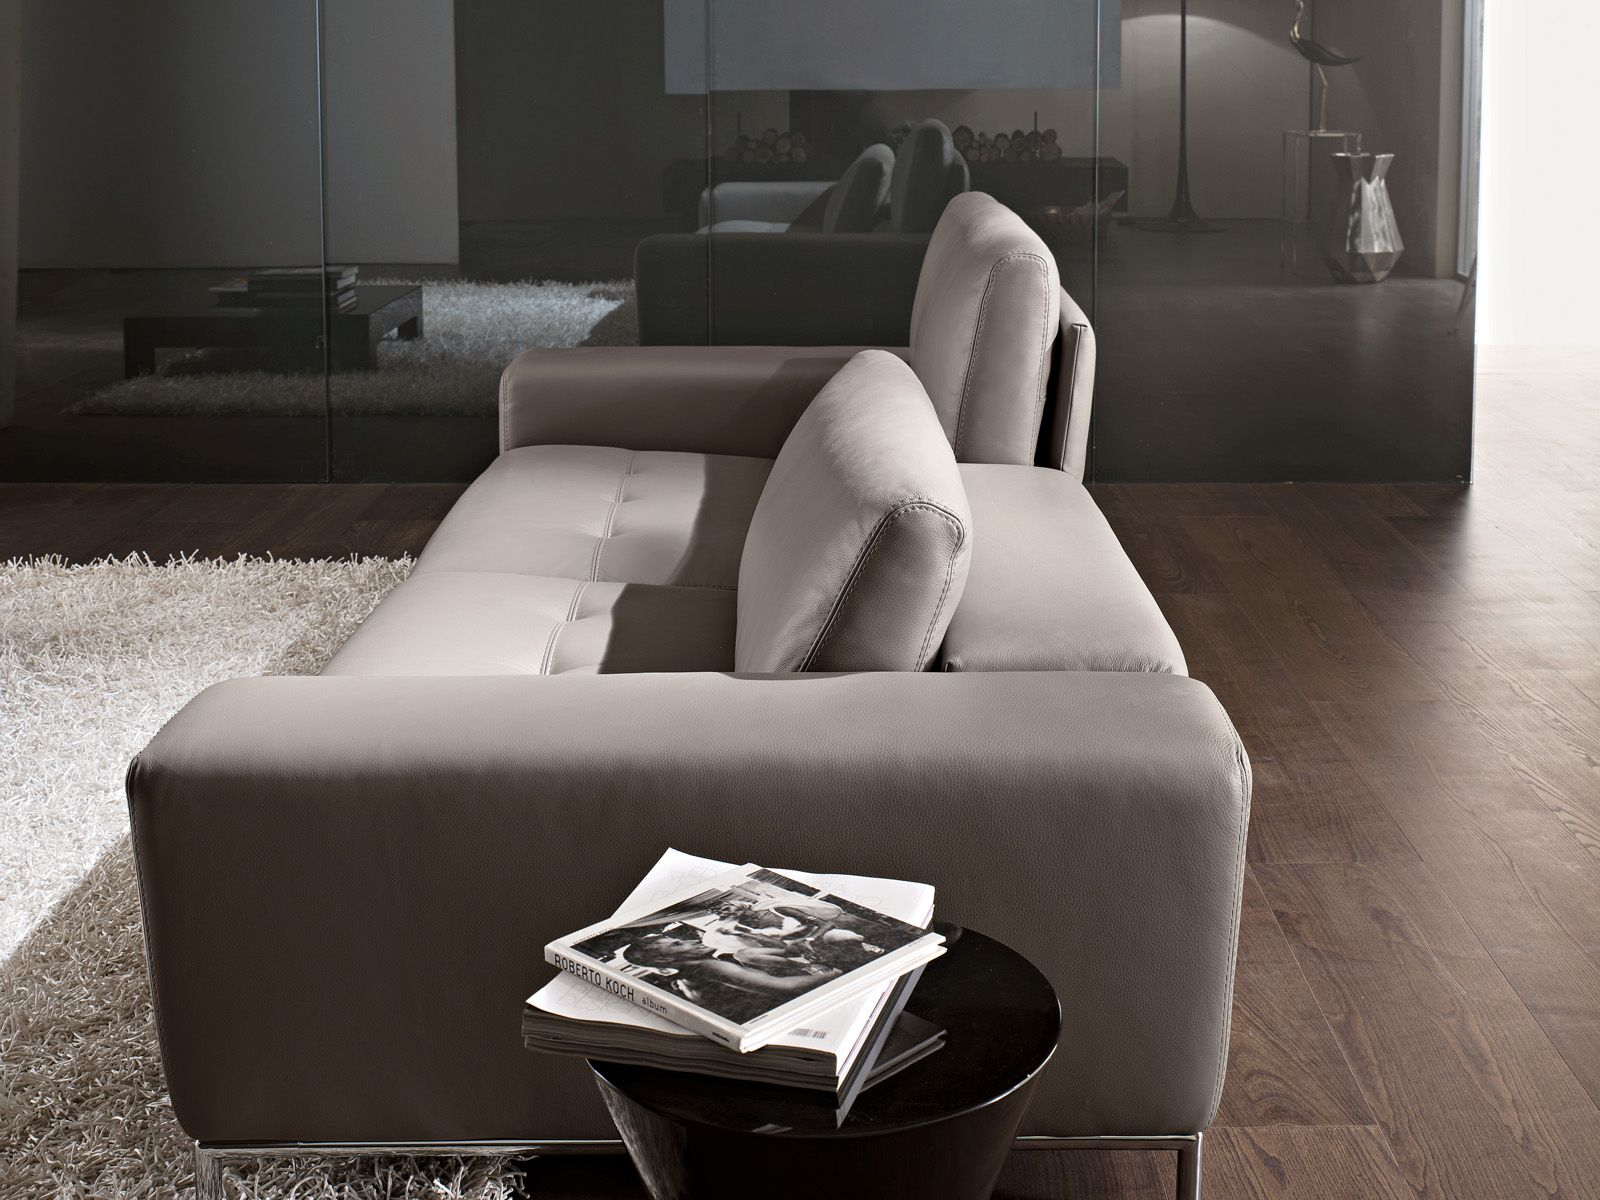 vip sofas vip sofas prianera ariel seriedie m bel aus italien. Black Bedroom Furniture Sets. Home Design Ideas